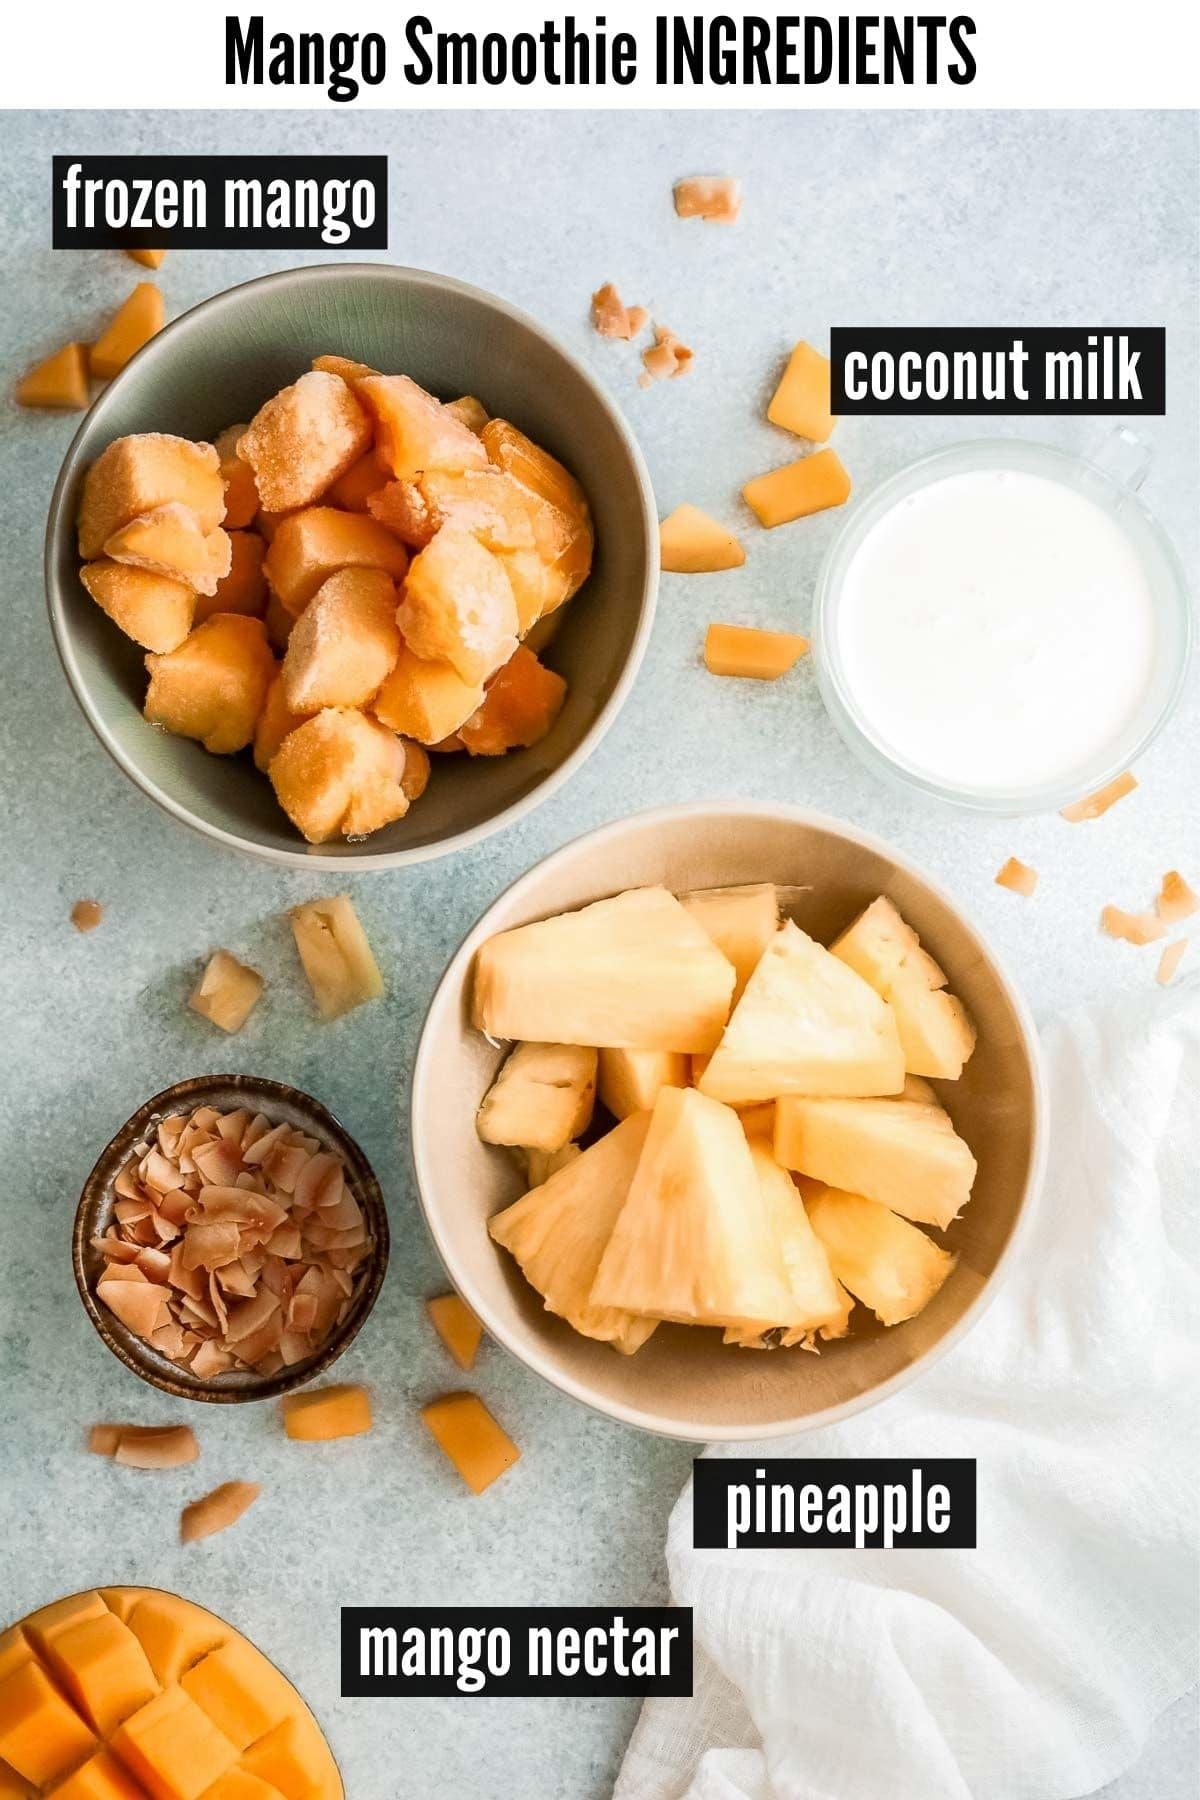 mango smoothie ingredients labelled